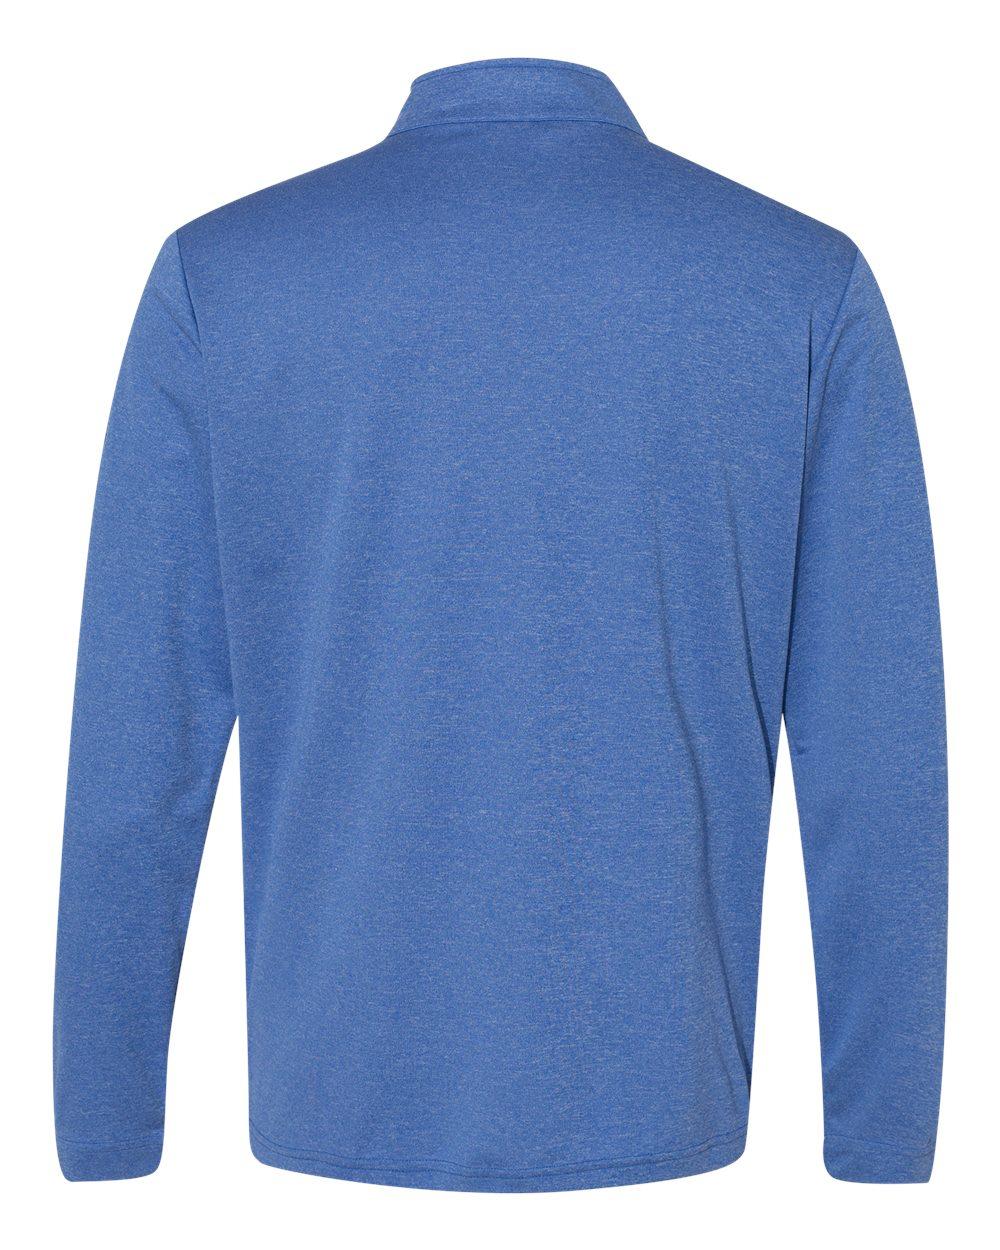 Adidas-Mens-Lightweight-UPF-pullover-Shirt-Warmup-A280-up-to-4XL thumbnail 13